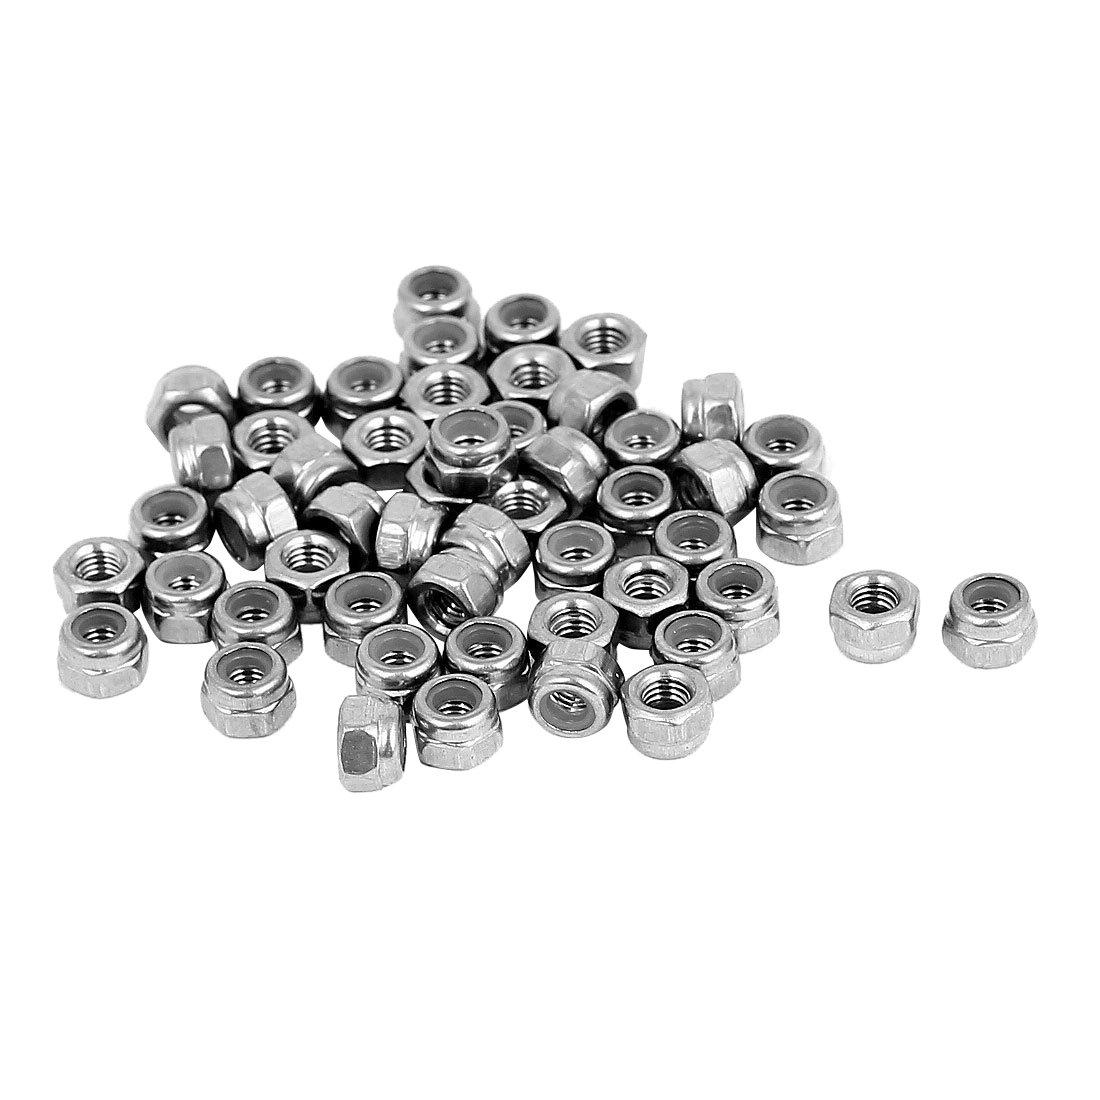 100 PCS M3 Nylon Insert Hex Lock Nuts Stainless Steel 304